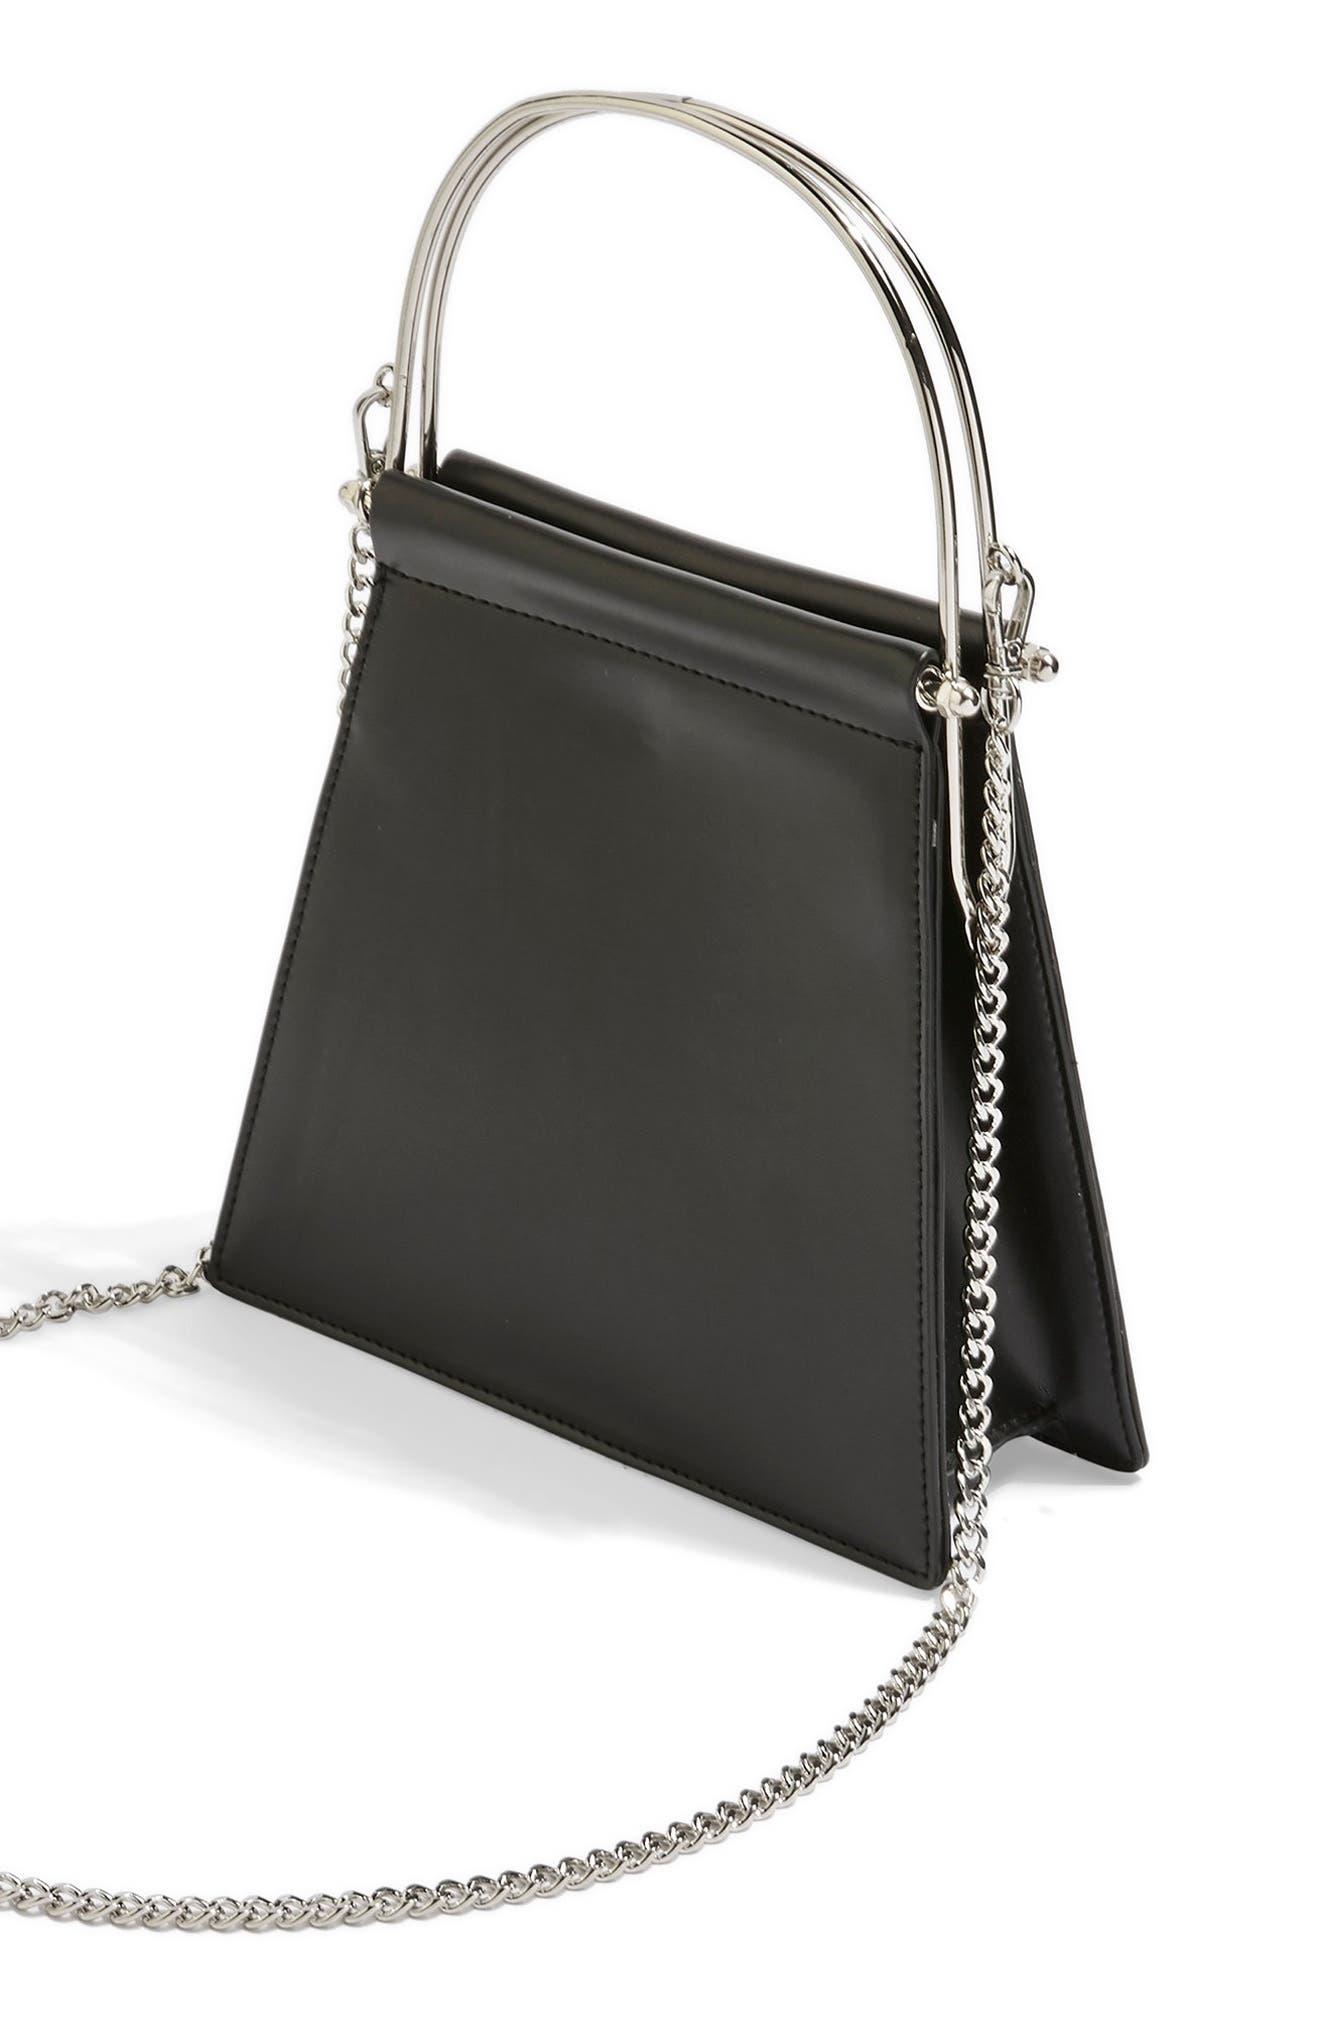 TOPSHOP,                             Lola Top Handle Bag,                             Alternate thumbnail 3, color,                             BLACK